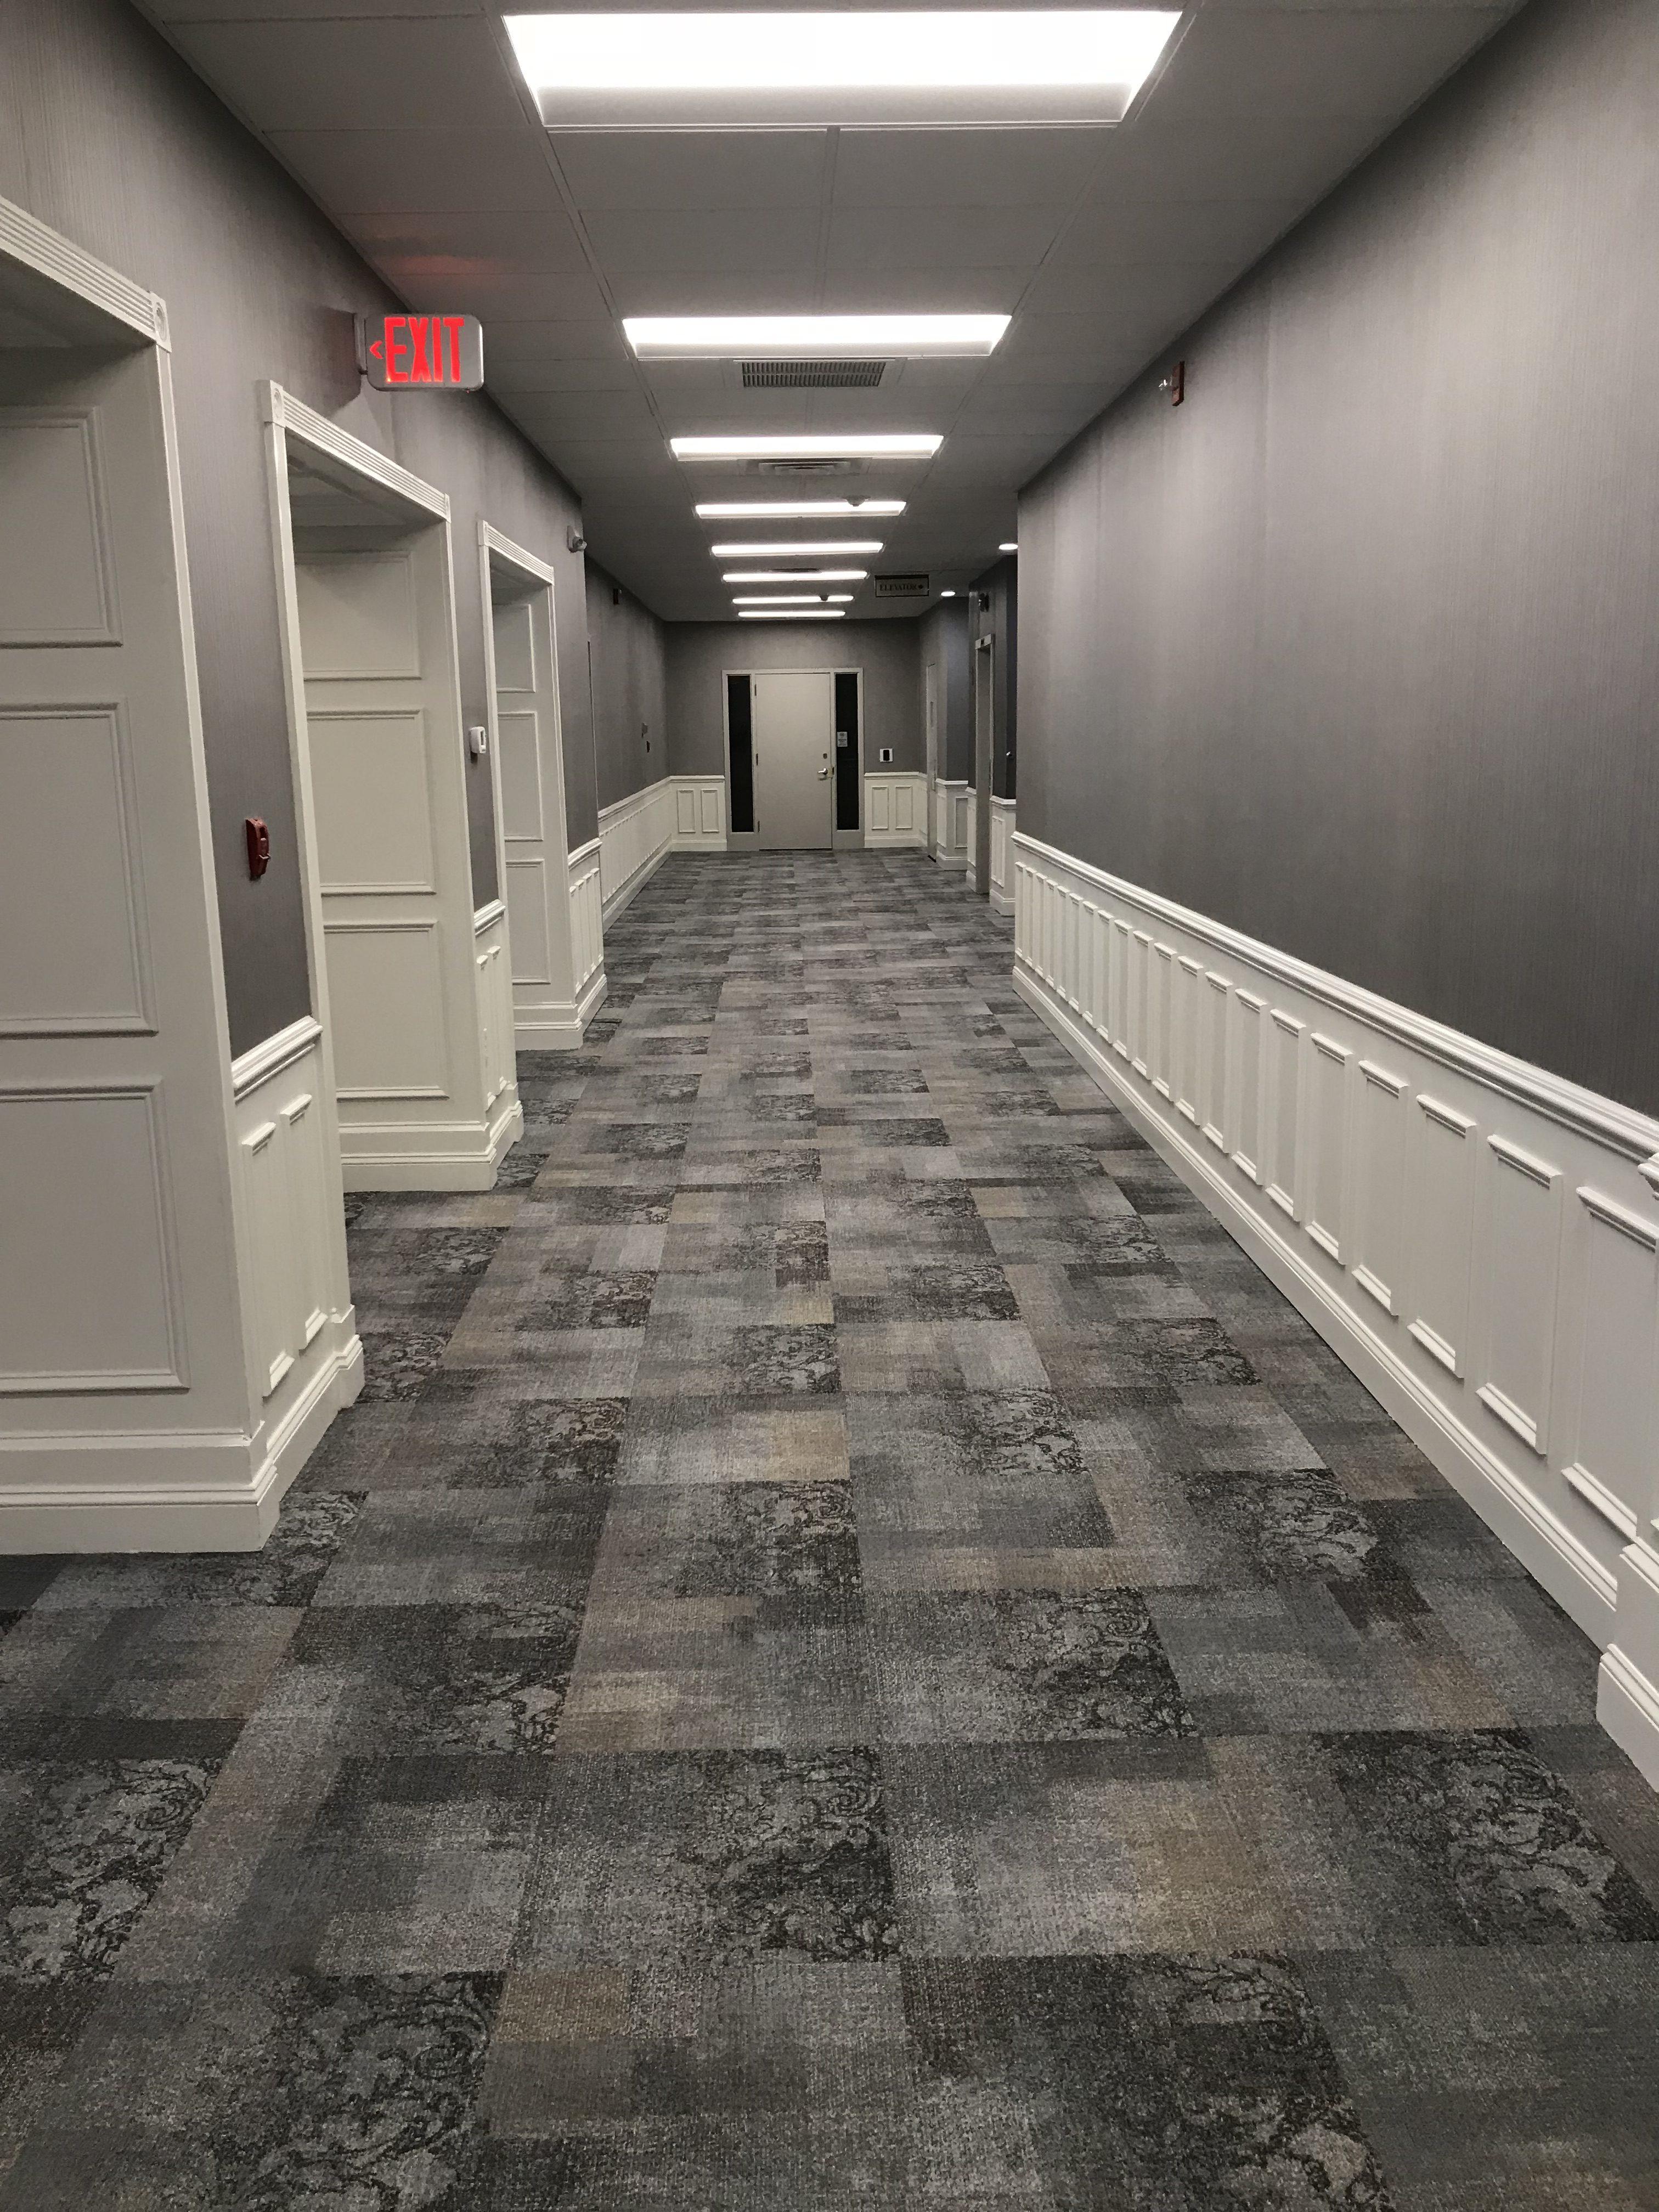 https://www.revoindustriesinc.com/wp-content/uploads/2018/12/2nd-FL.-Corridor-e1545342013191.jpg